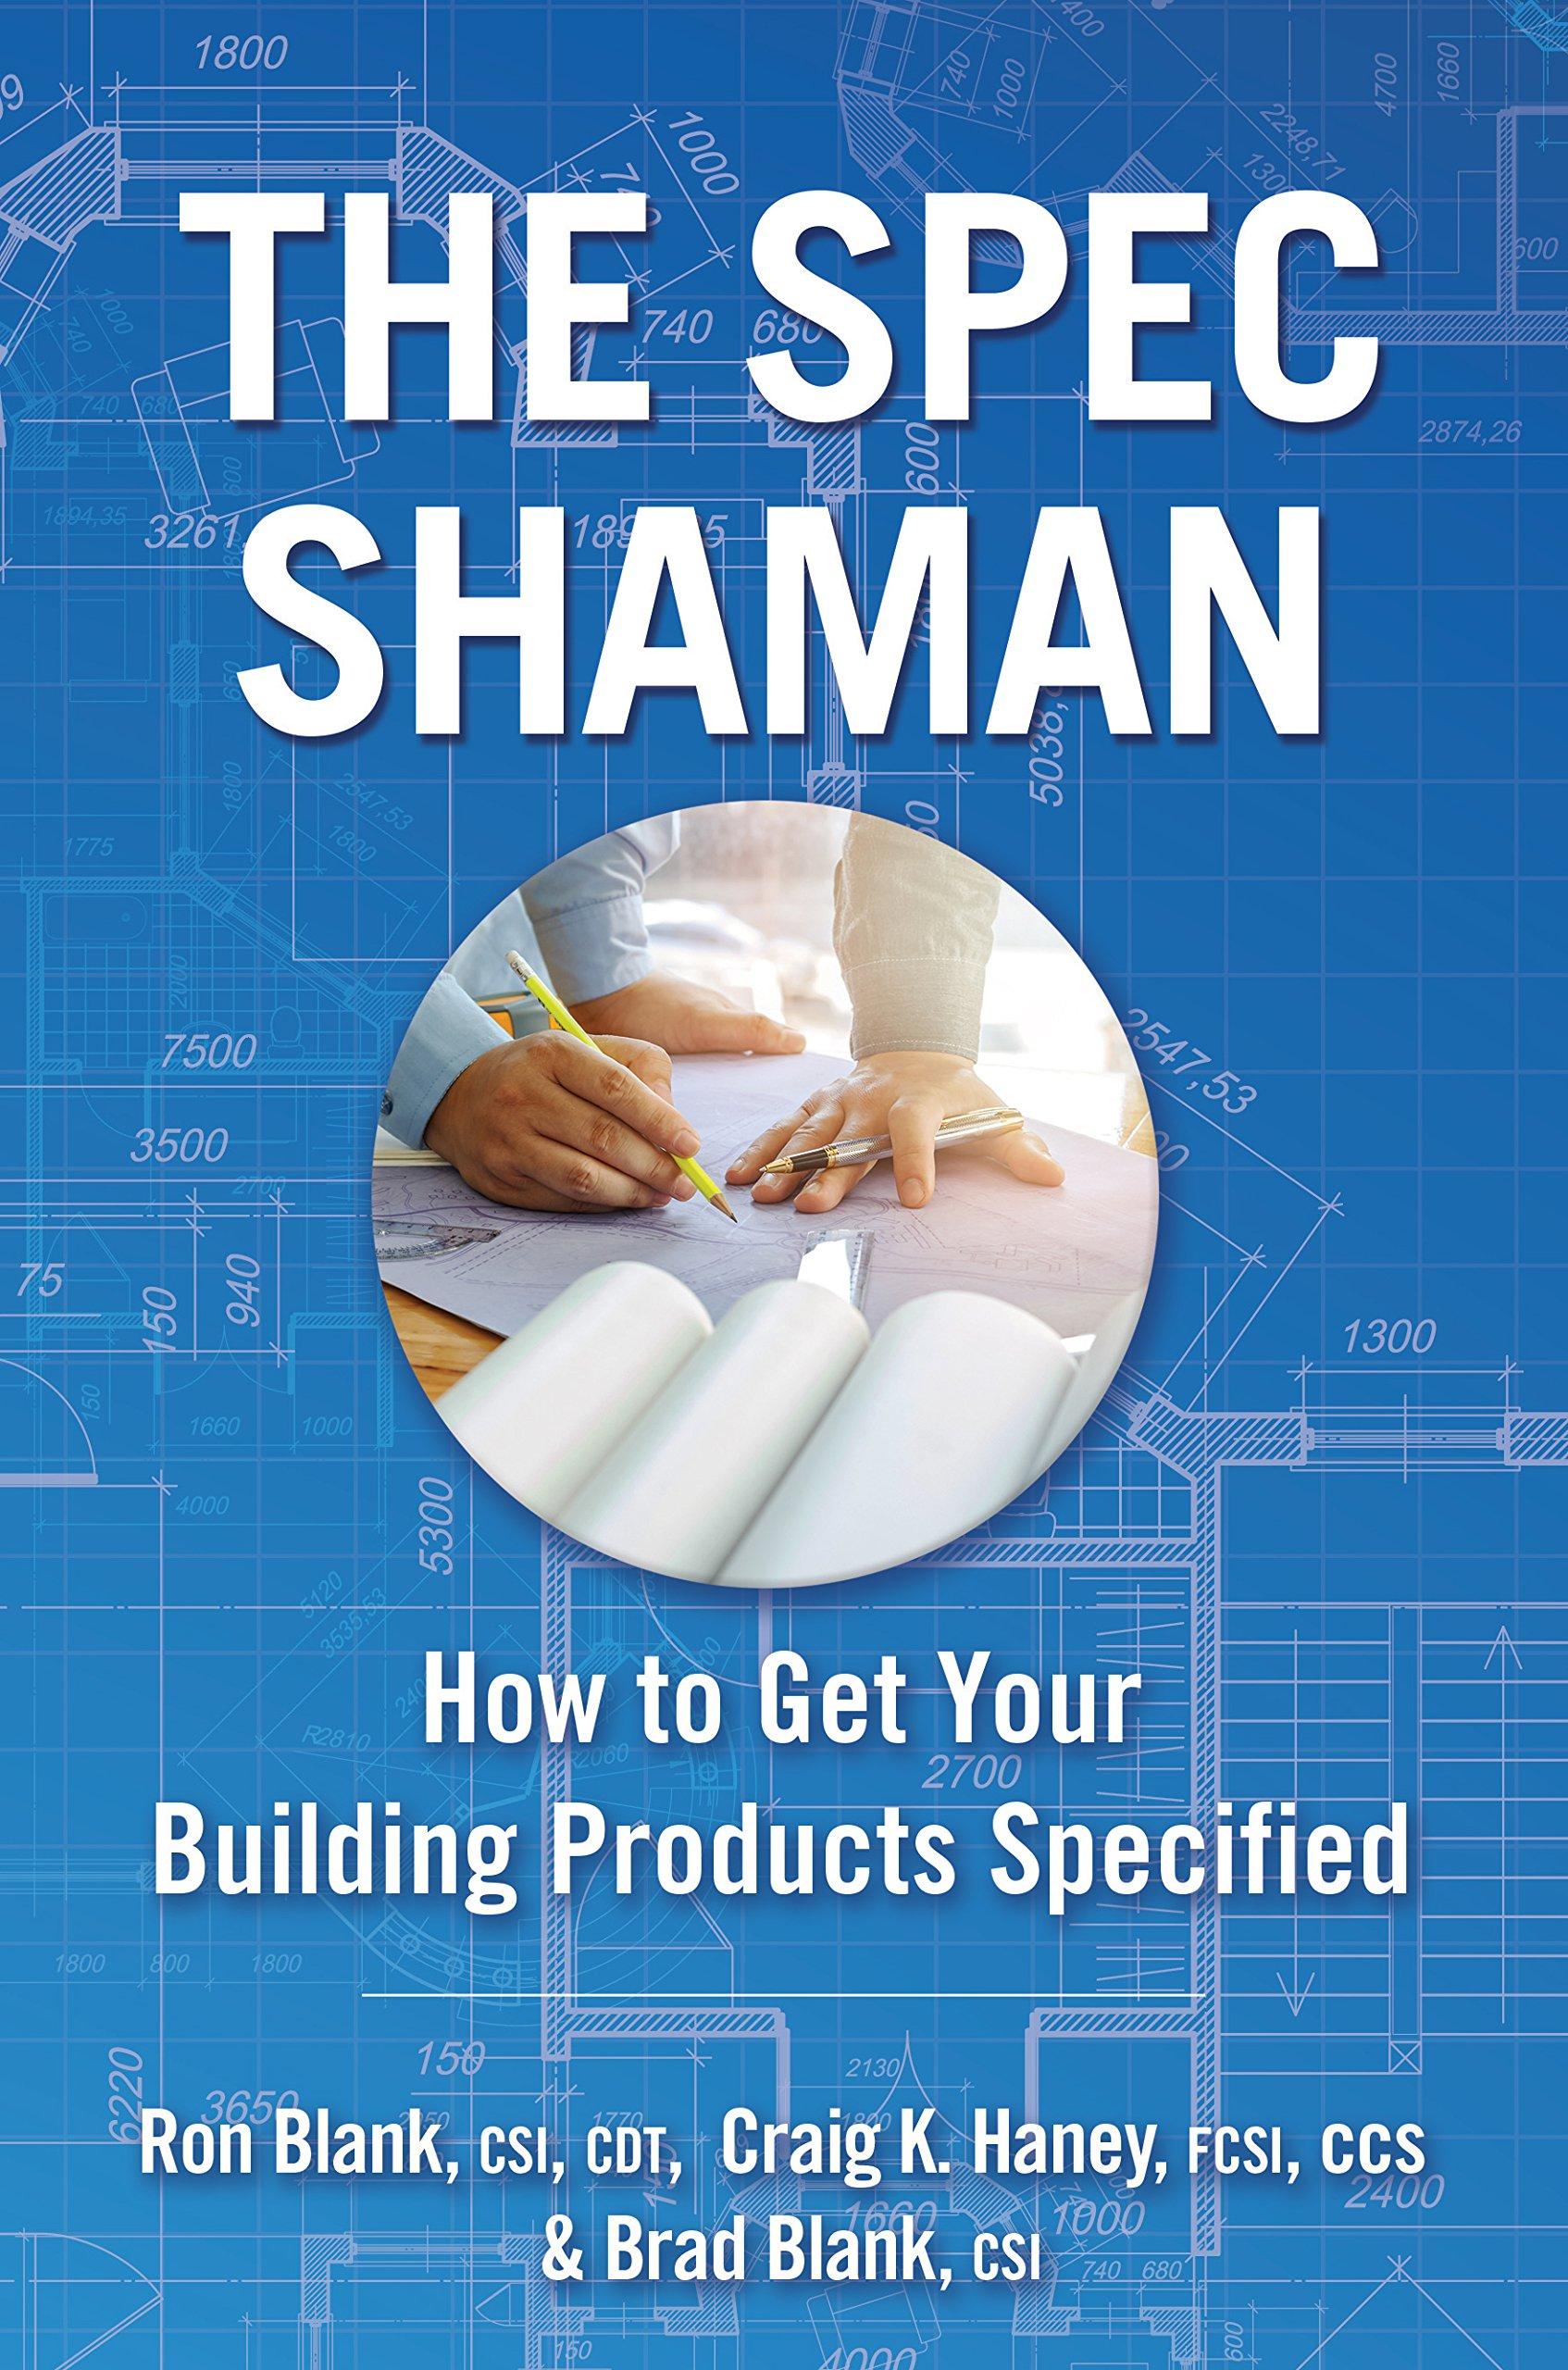 The Spec Shaman ebook